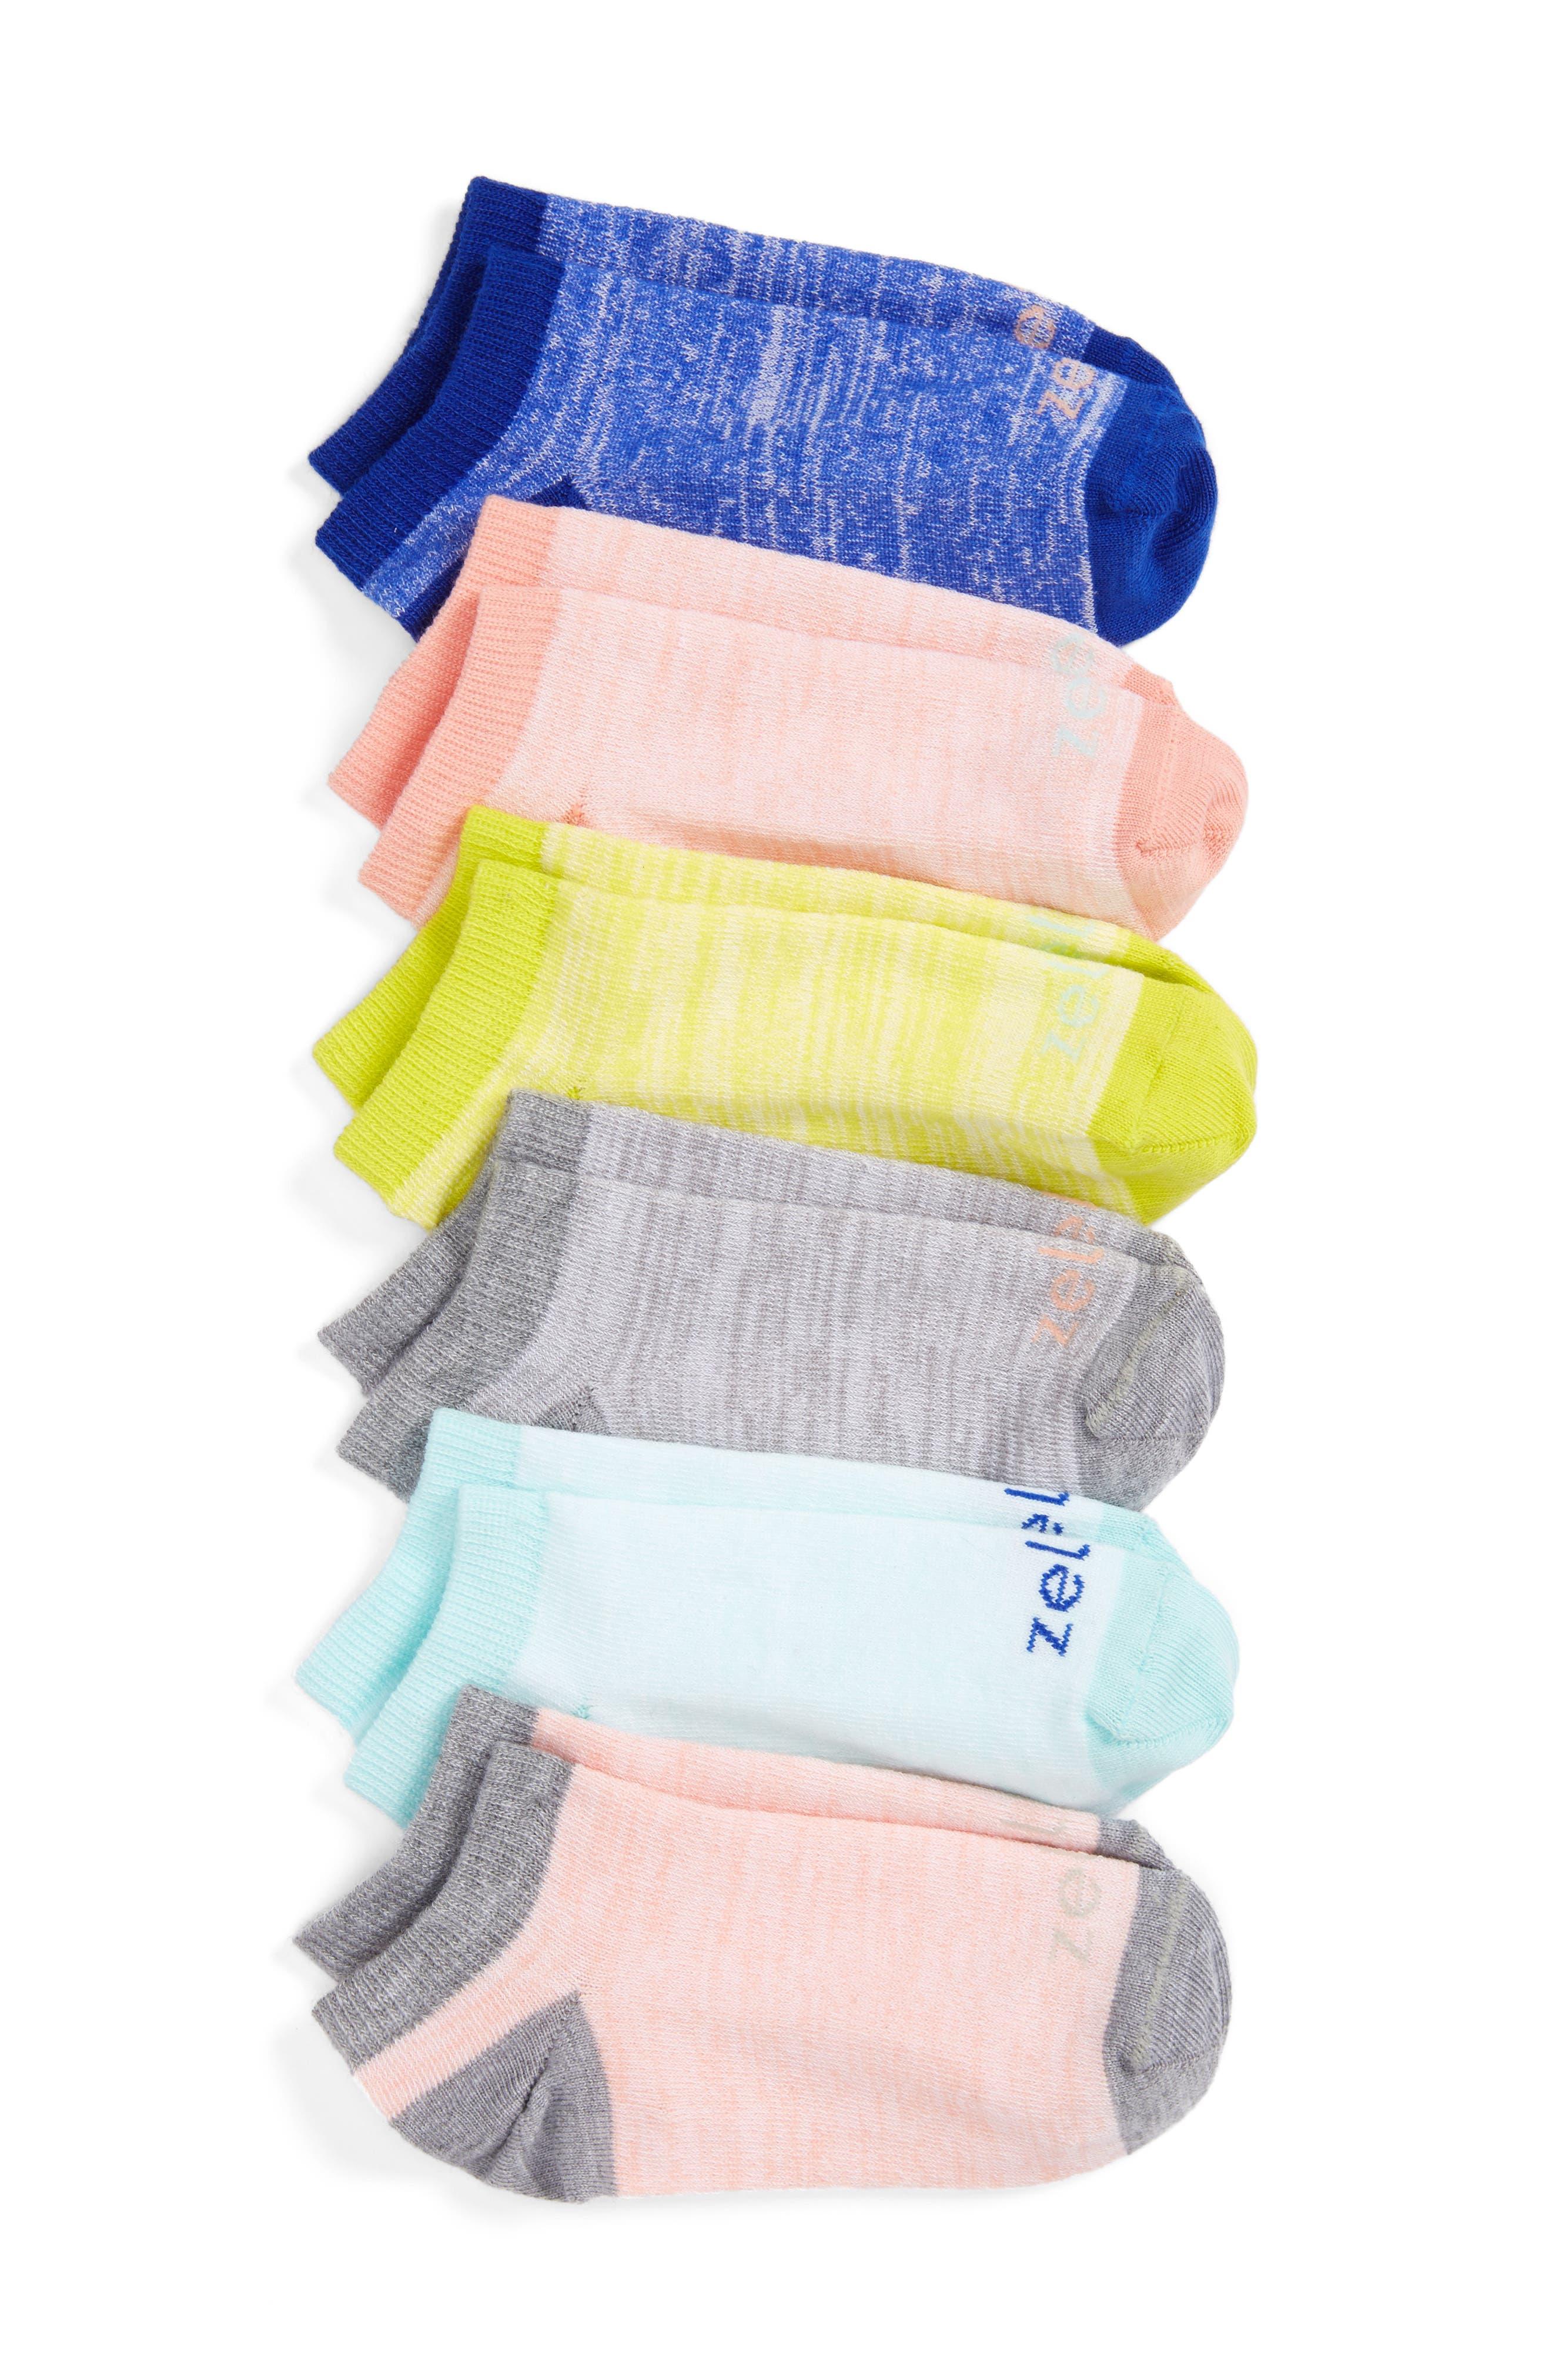 6-Pack Ankle Socks,                             Main thumbnail 10, color,